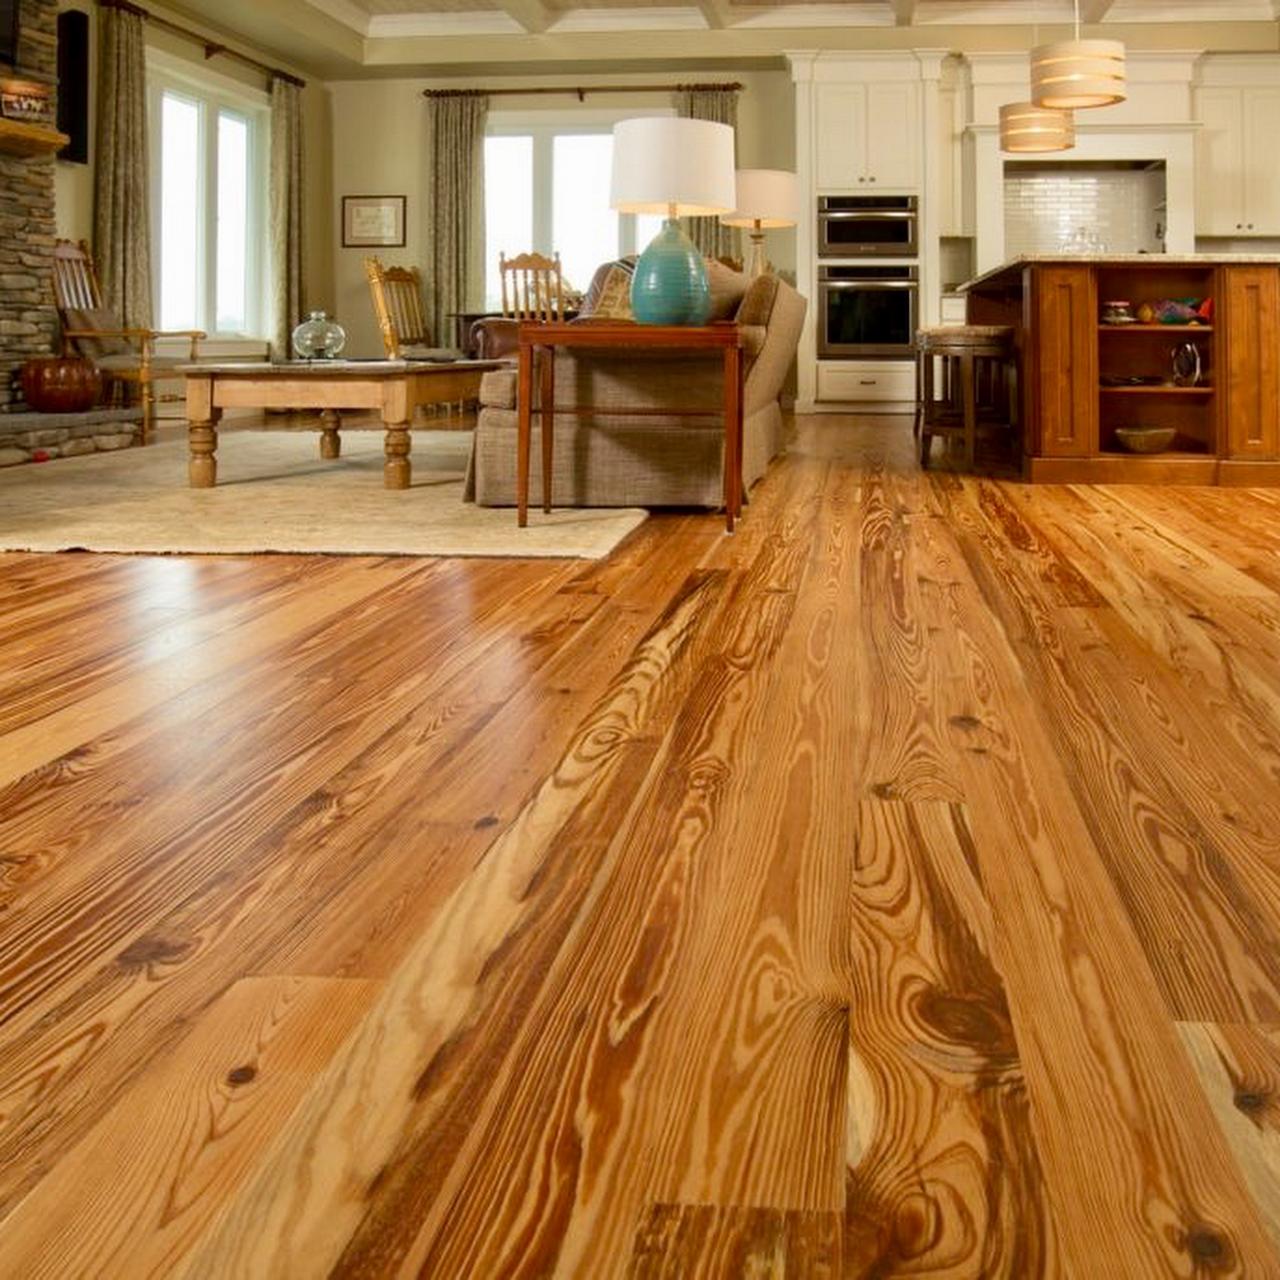 Majestic Hardwood Floors Inc Majestic Hardwood Floors